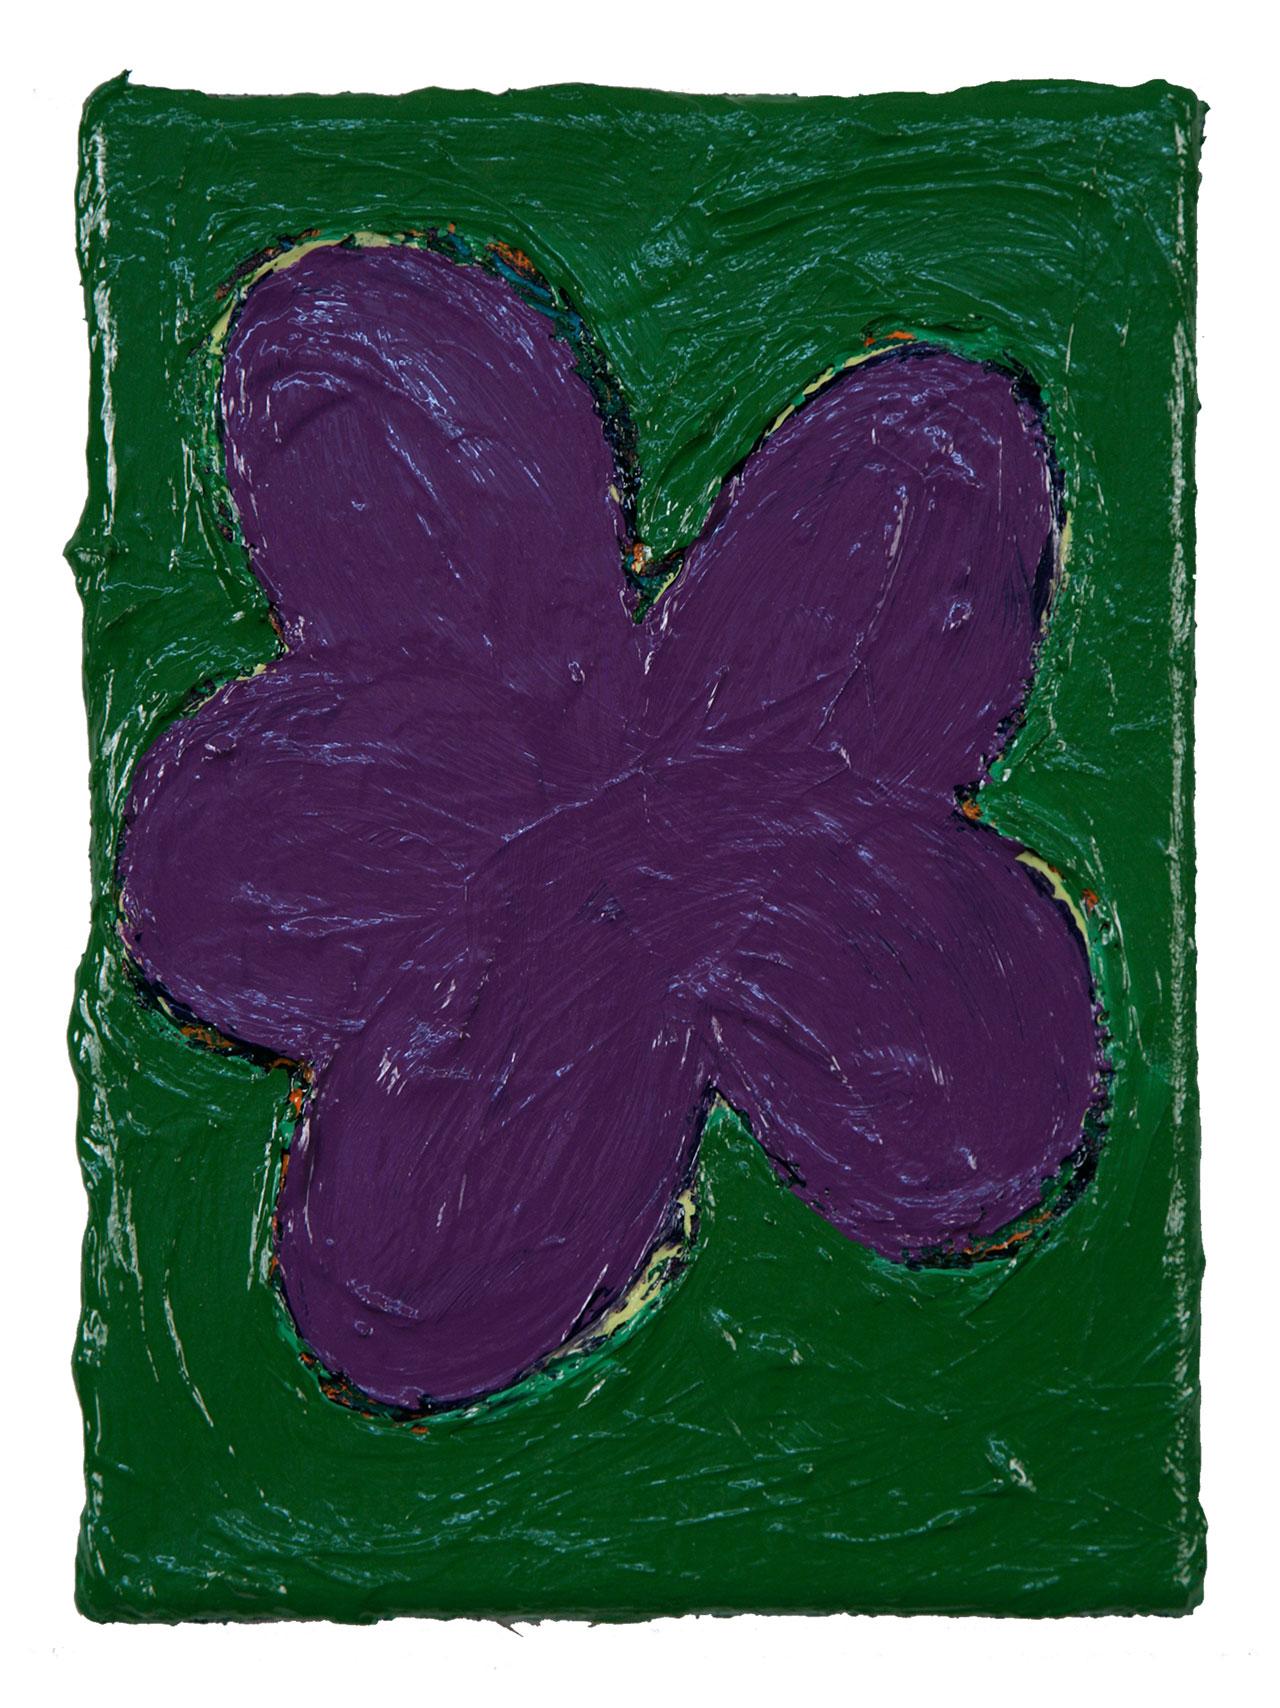 25 Flowers 4 | 2008 © Kerstin Jeckel | MEMORY-PROJEKT # extra